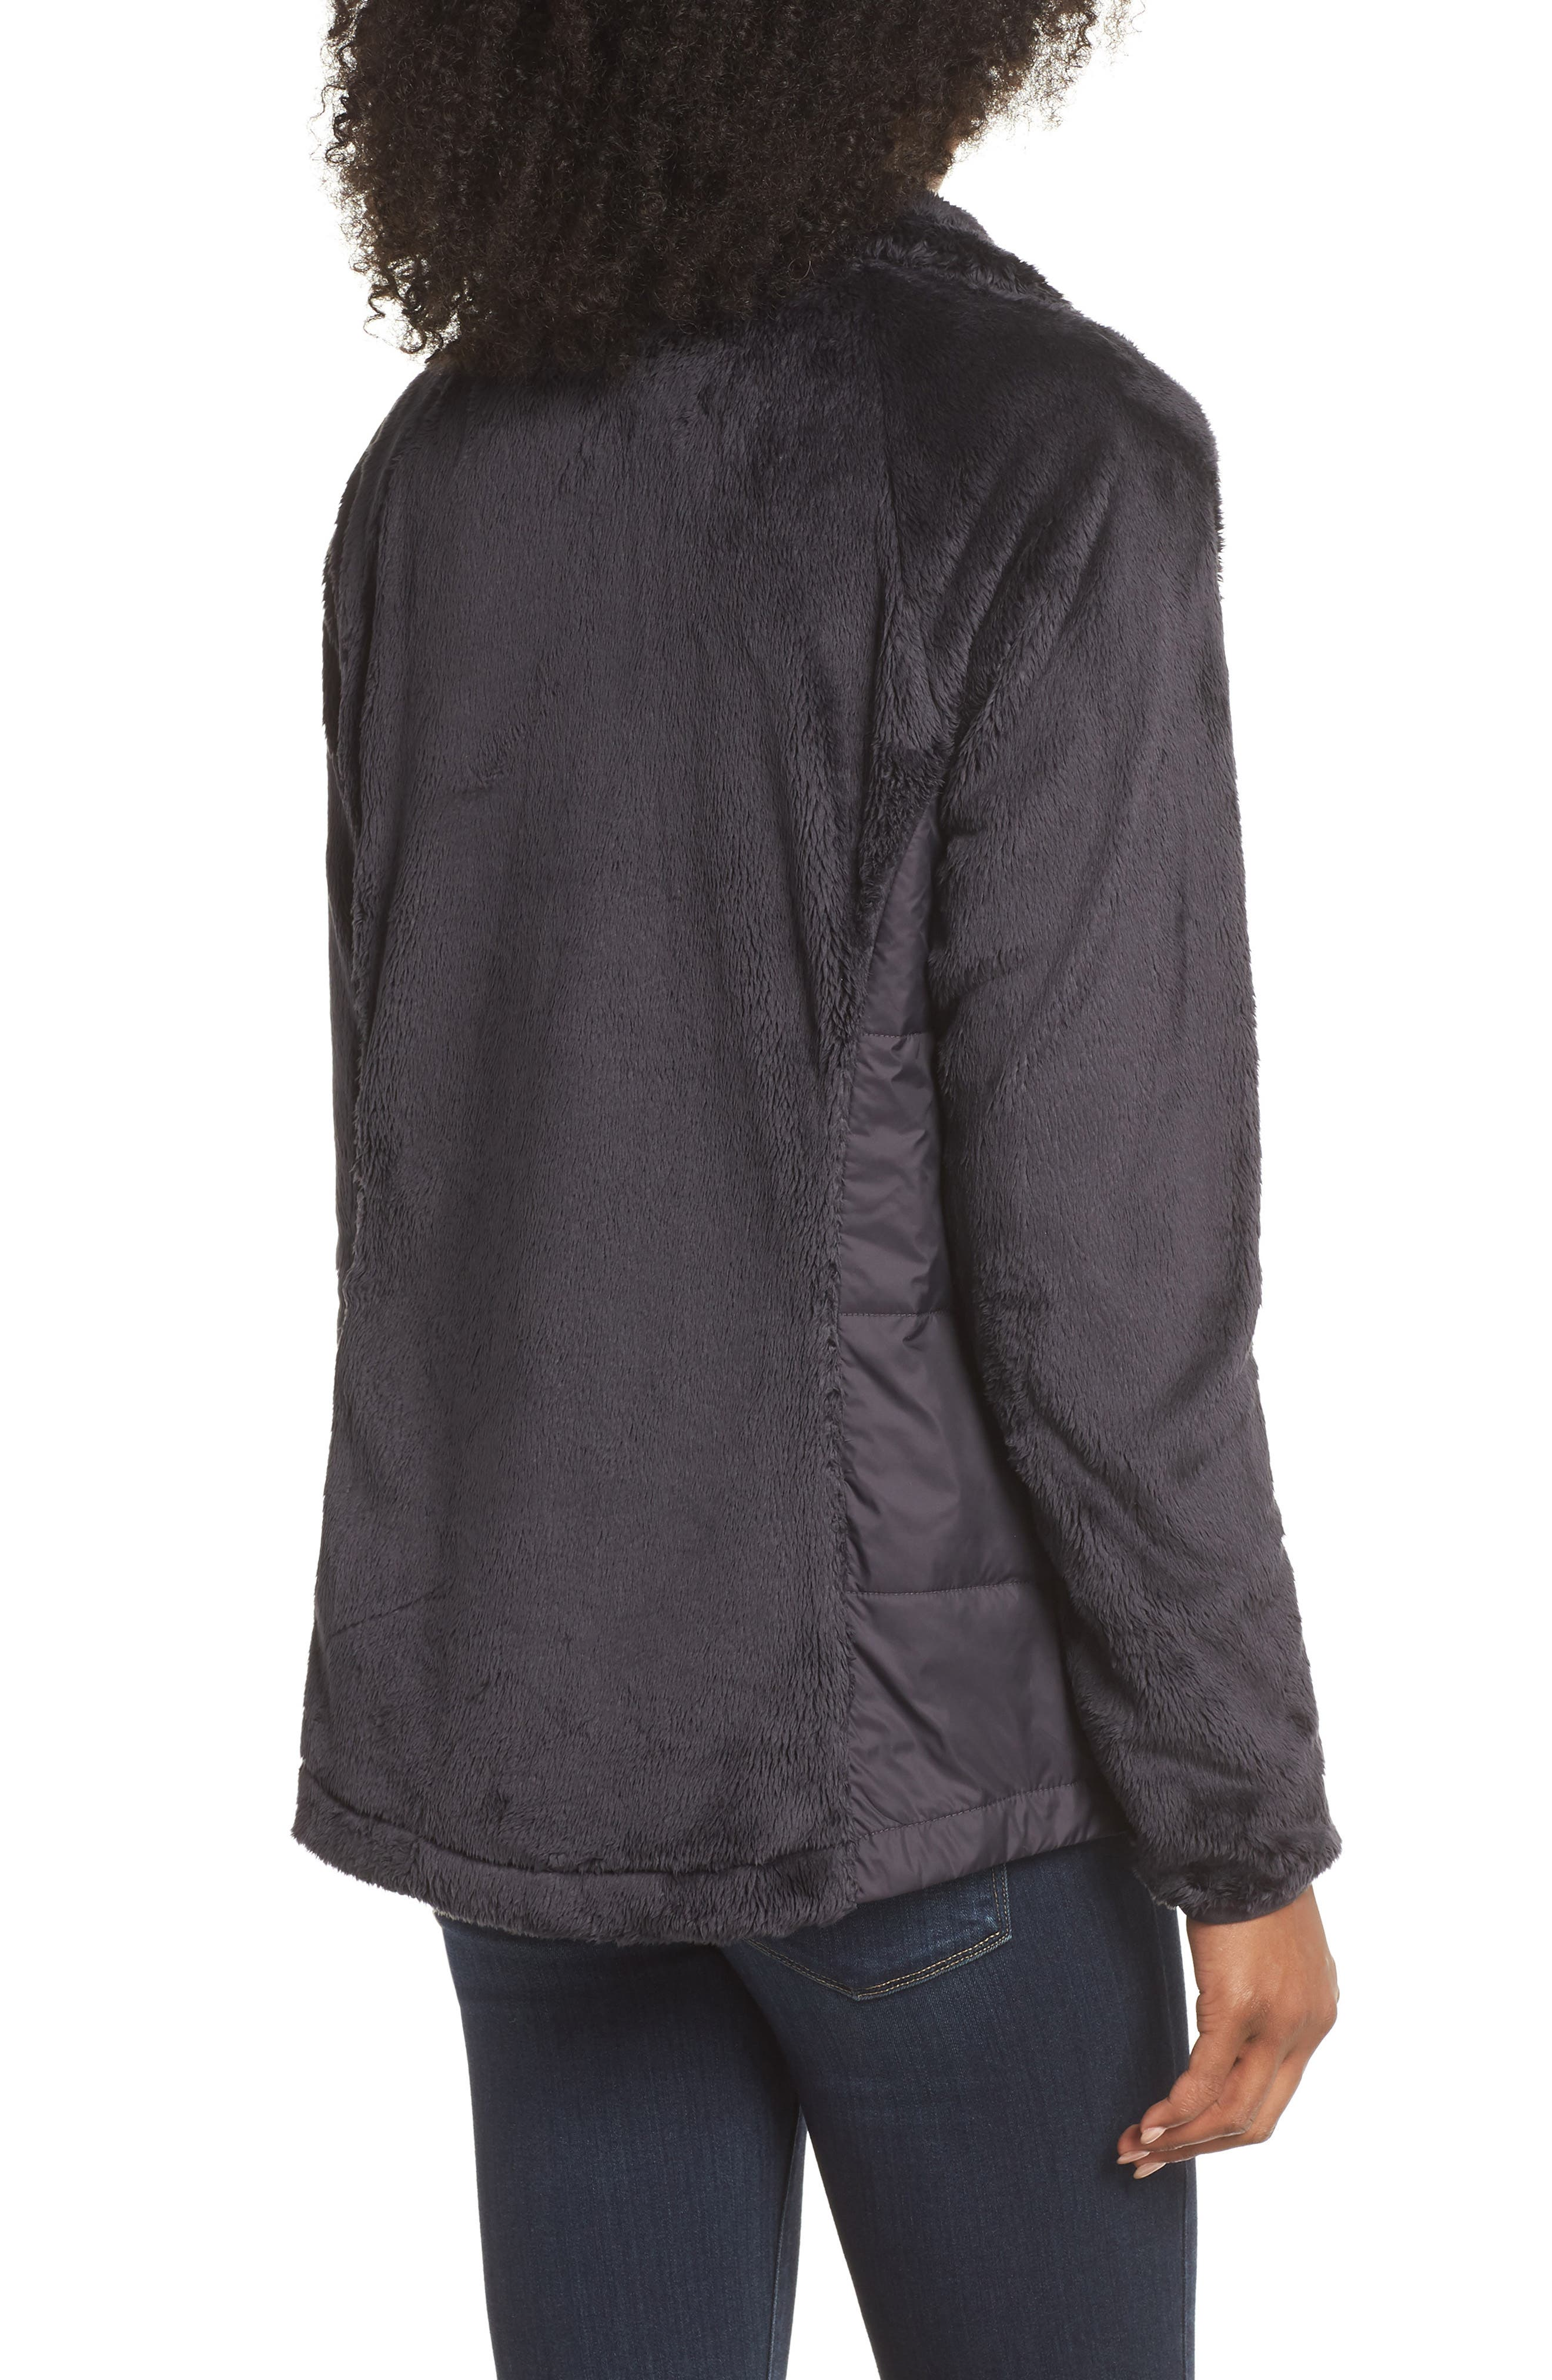 Osito Sport Hybrid Jacket,                             Alternate thumbnail 2, color,                             WEATHERED BLACK